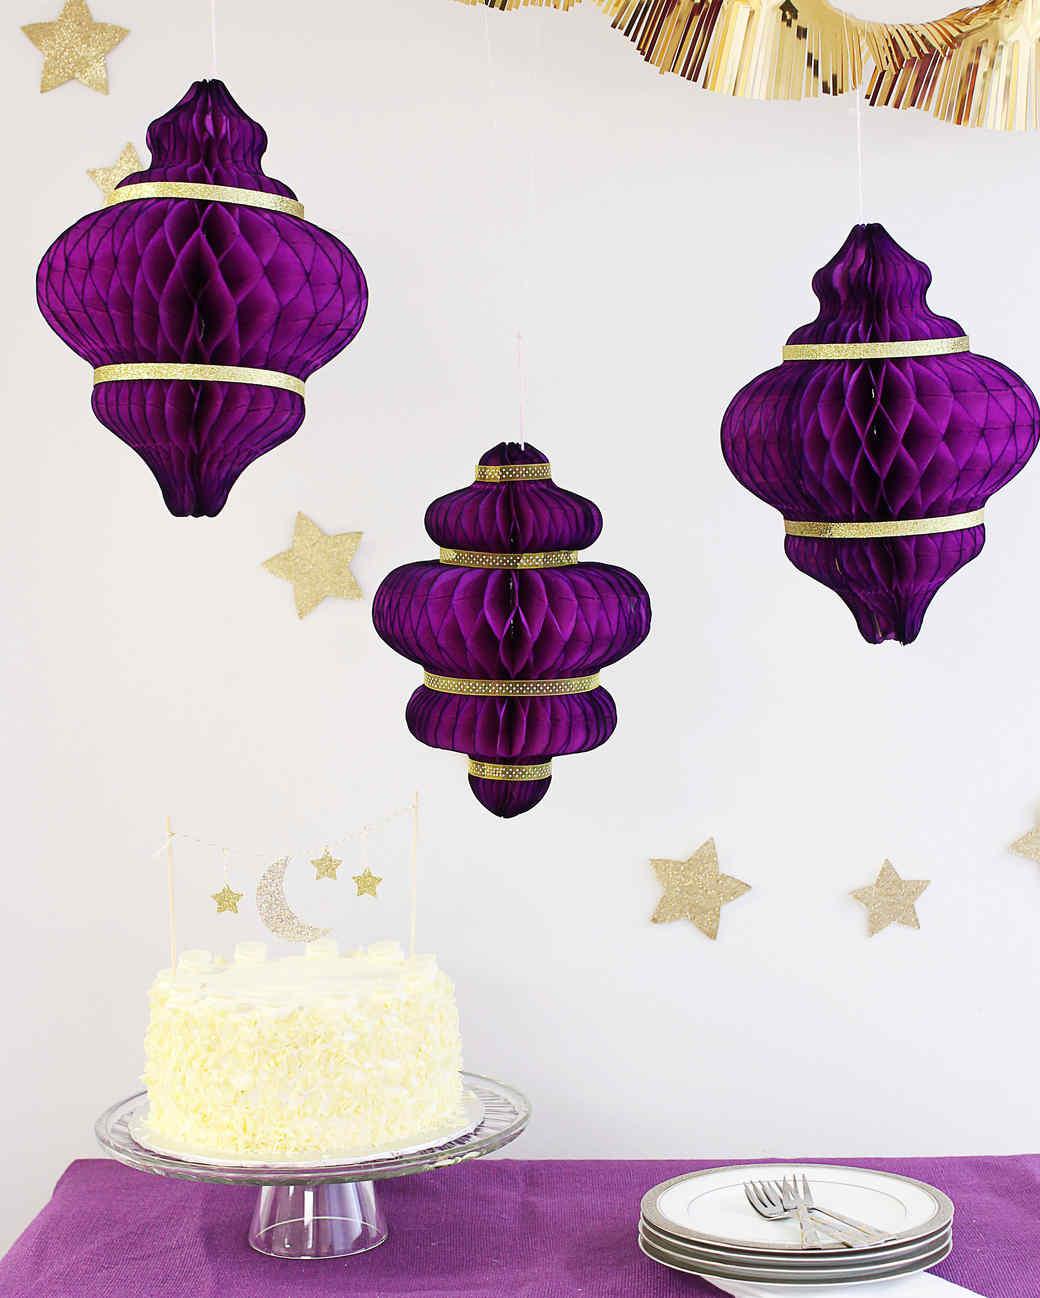 Fantastic Diy Eid Al-Fitr Decorations - eid-al-fitr-paper-lanterns-and-cake-topper-0617_vert  Trends_576592 .jpg?itok\u003dP0JaIxS8